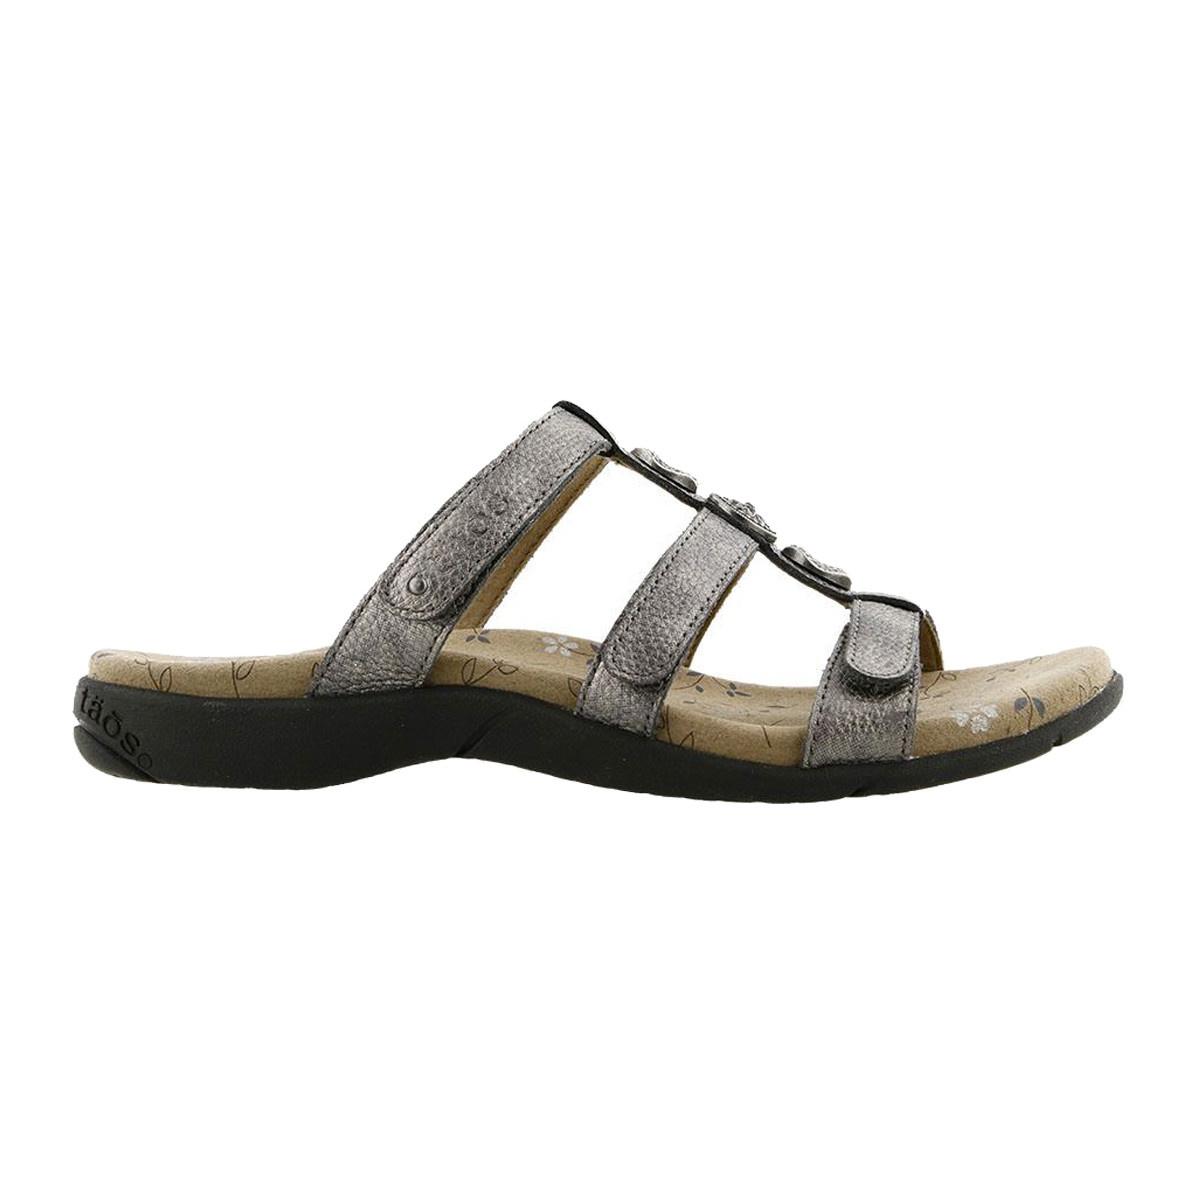 Taos Footwear Taos Women's Prize 3 Sandal